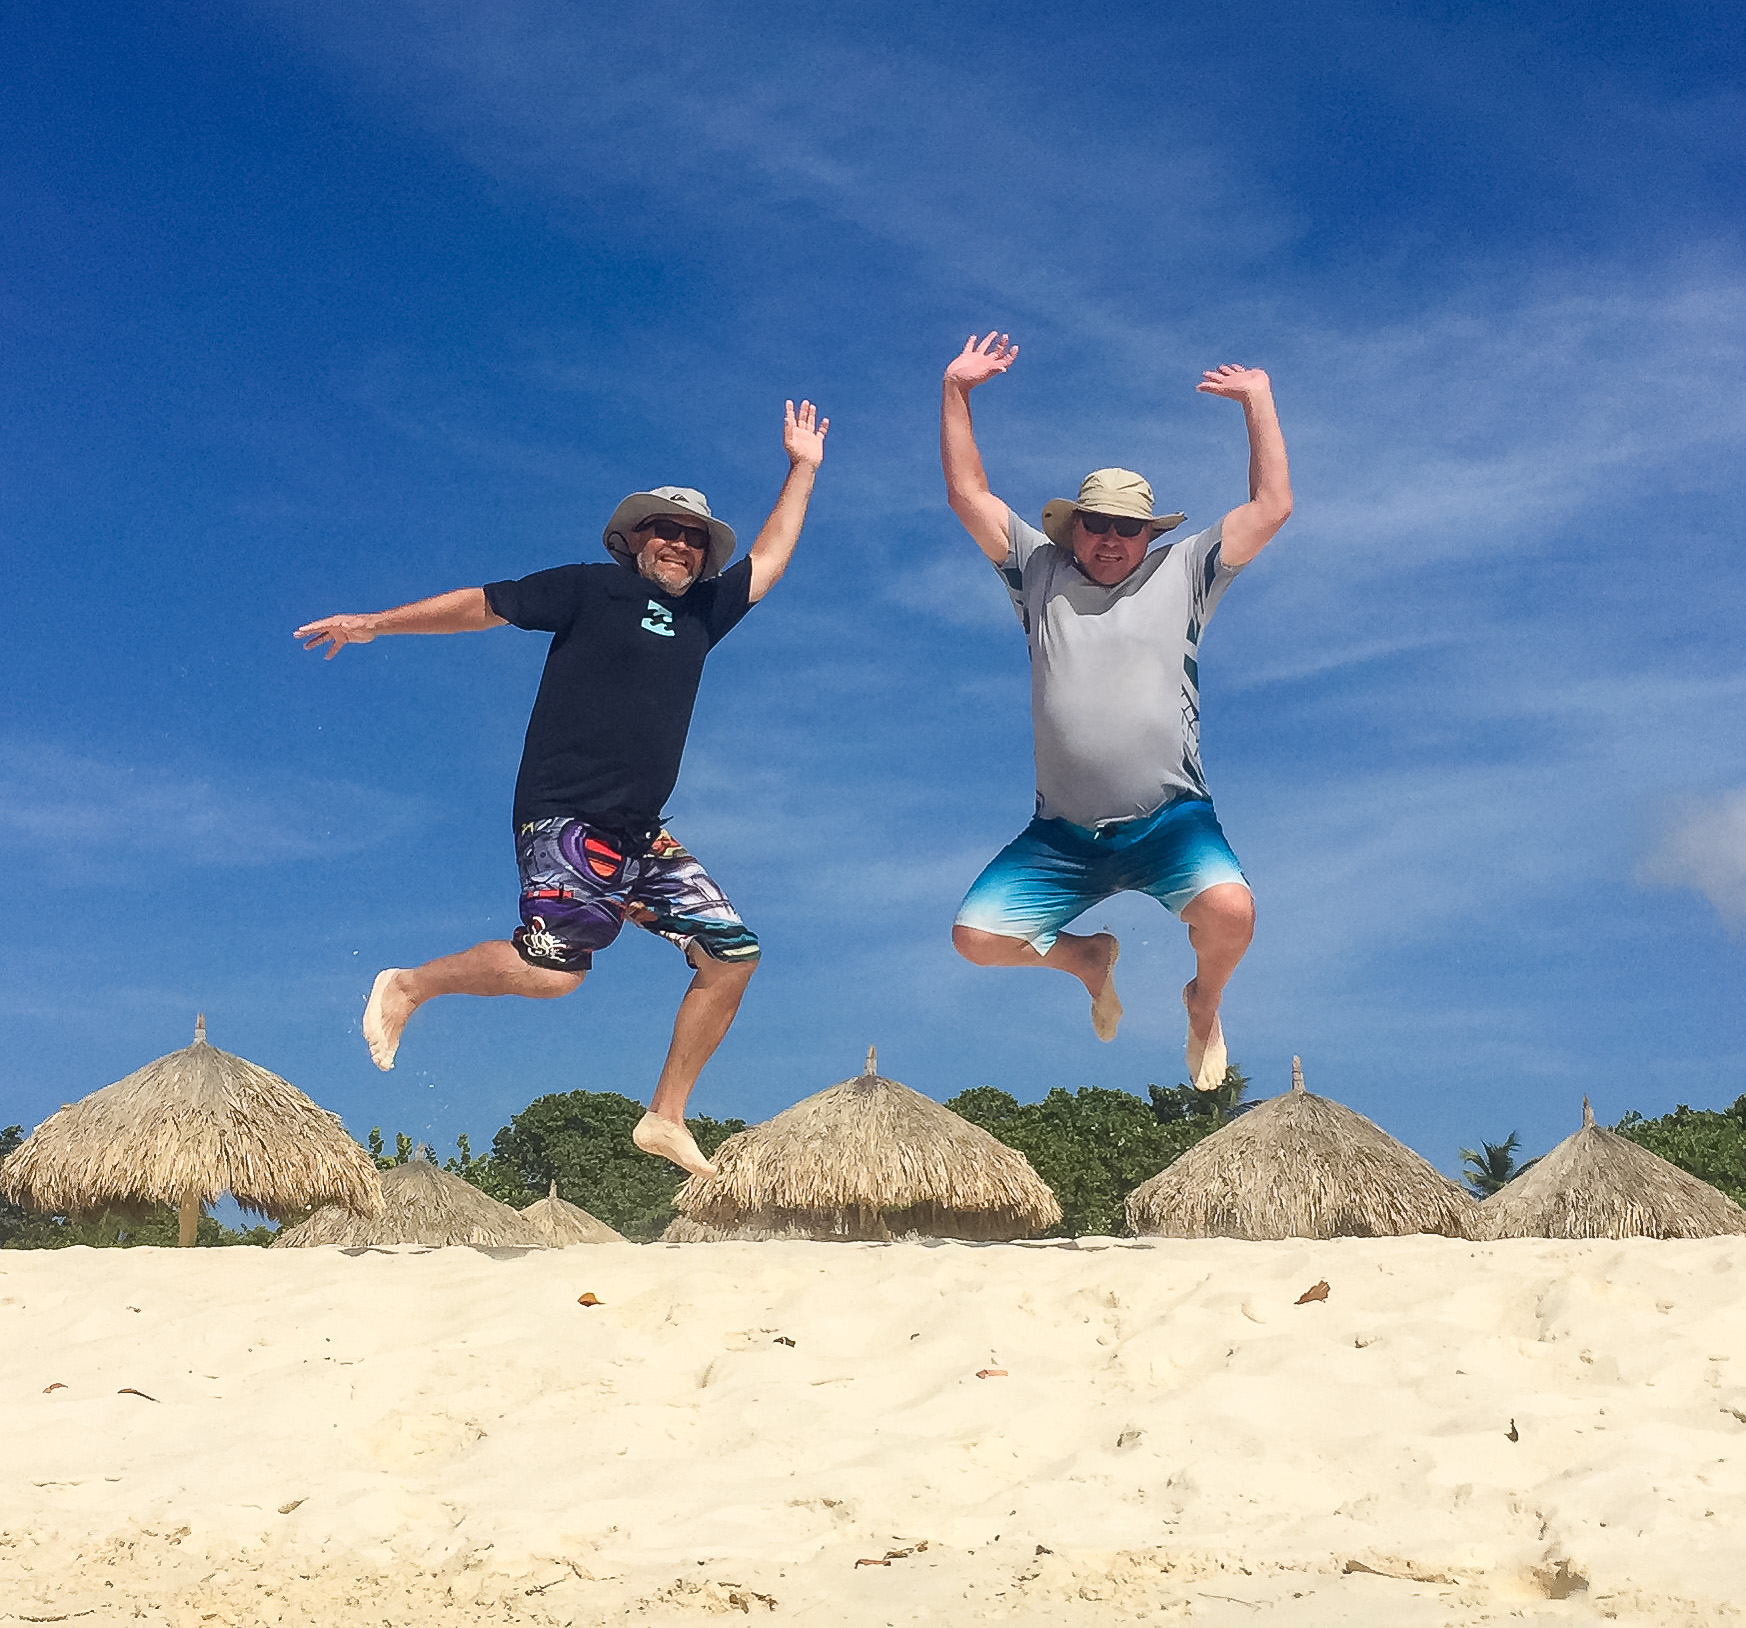 No sun tan for these two white boys